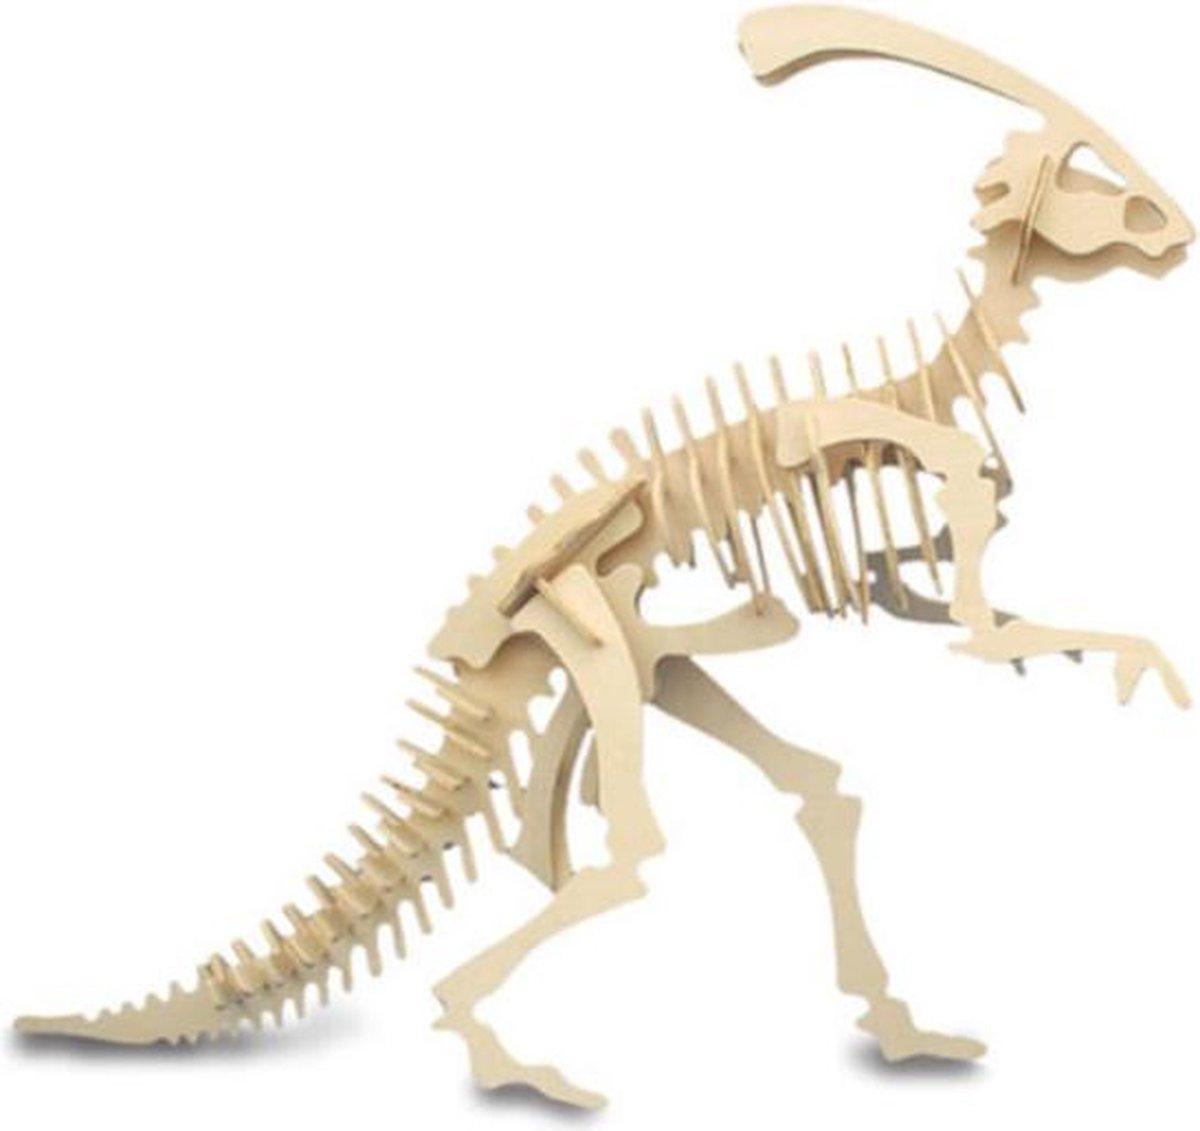 Bouwpakket 3D Puzzel Dinosaurus Parasaurolophus - hout